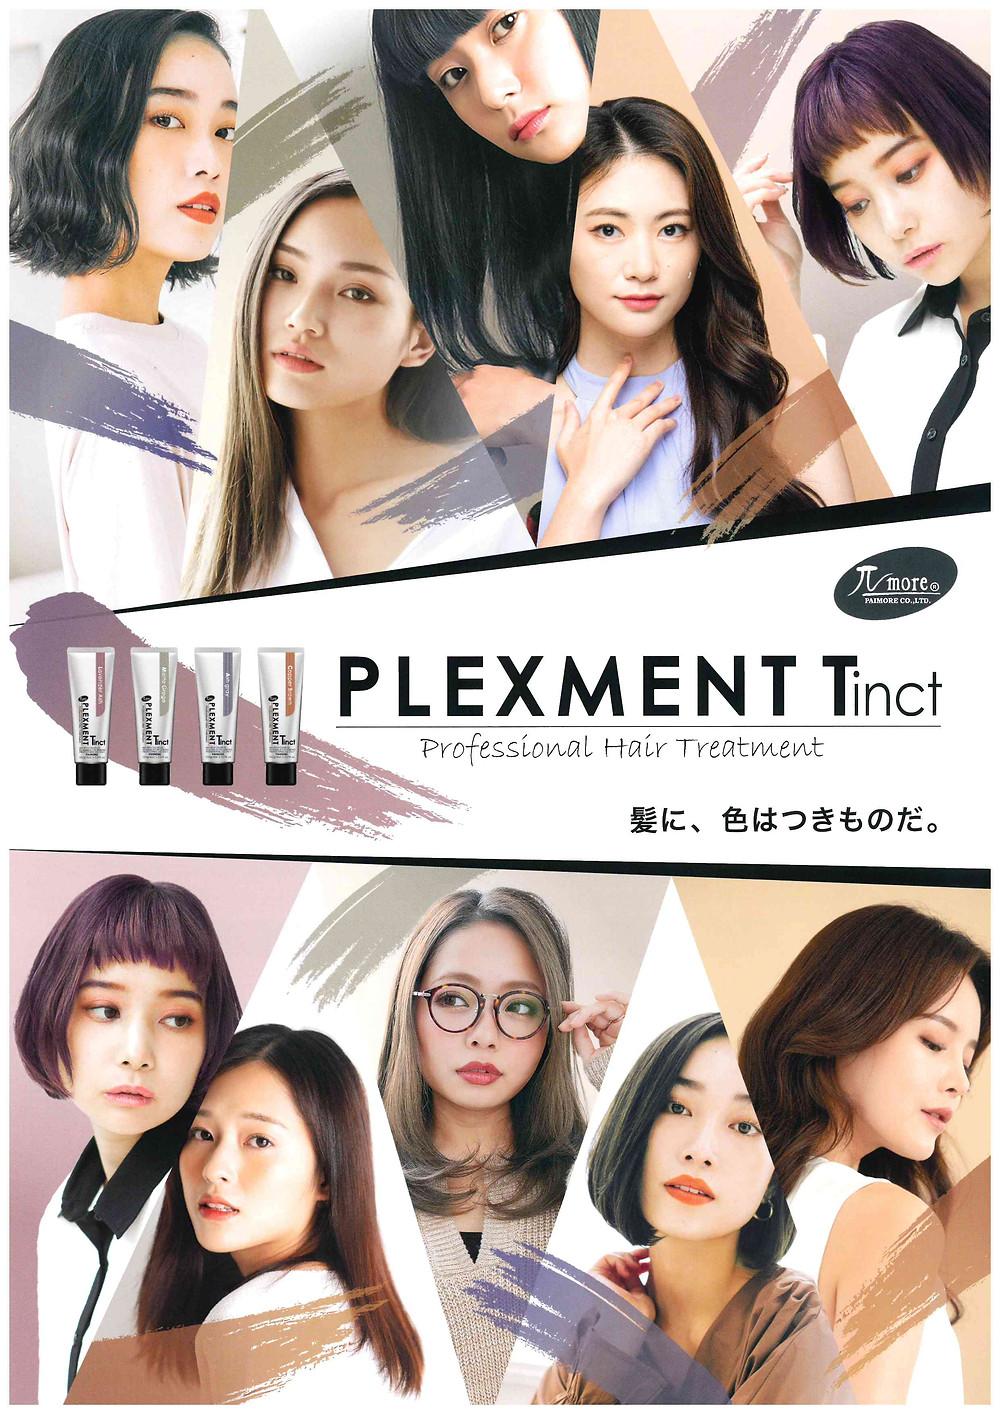 PLEXMENT Tinct